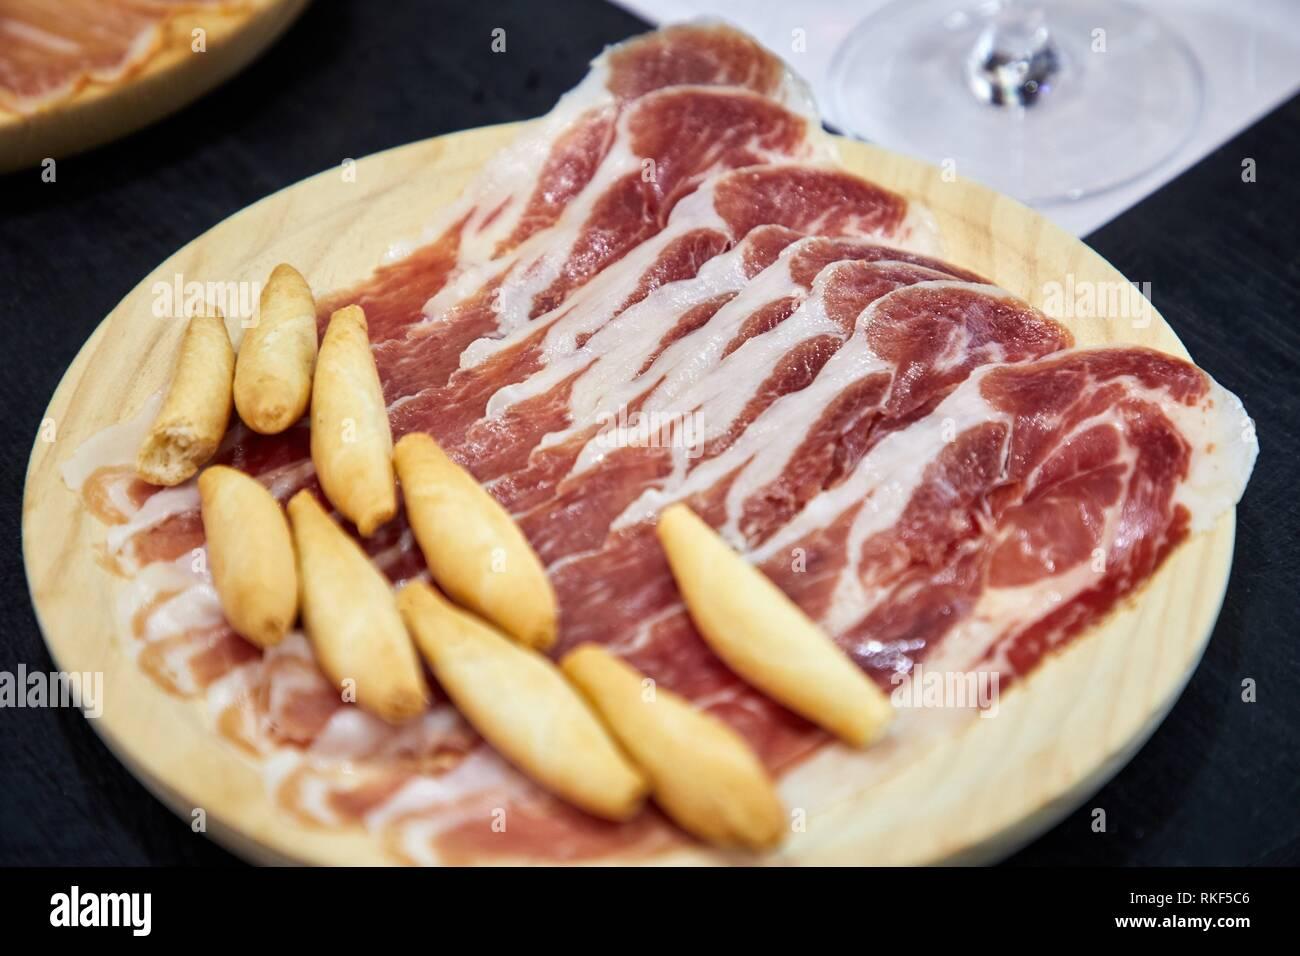 Tasting of ham, Charcuterie, Gastronomic tour, Donostia, San Sebastian, Gipuzkoa, Basque Country, Spain, Europe - Stock Image